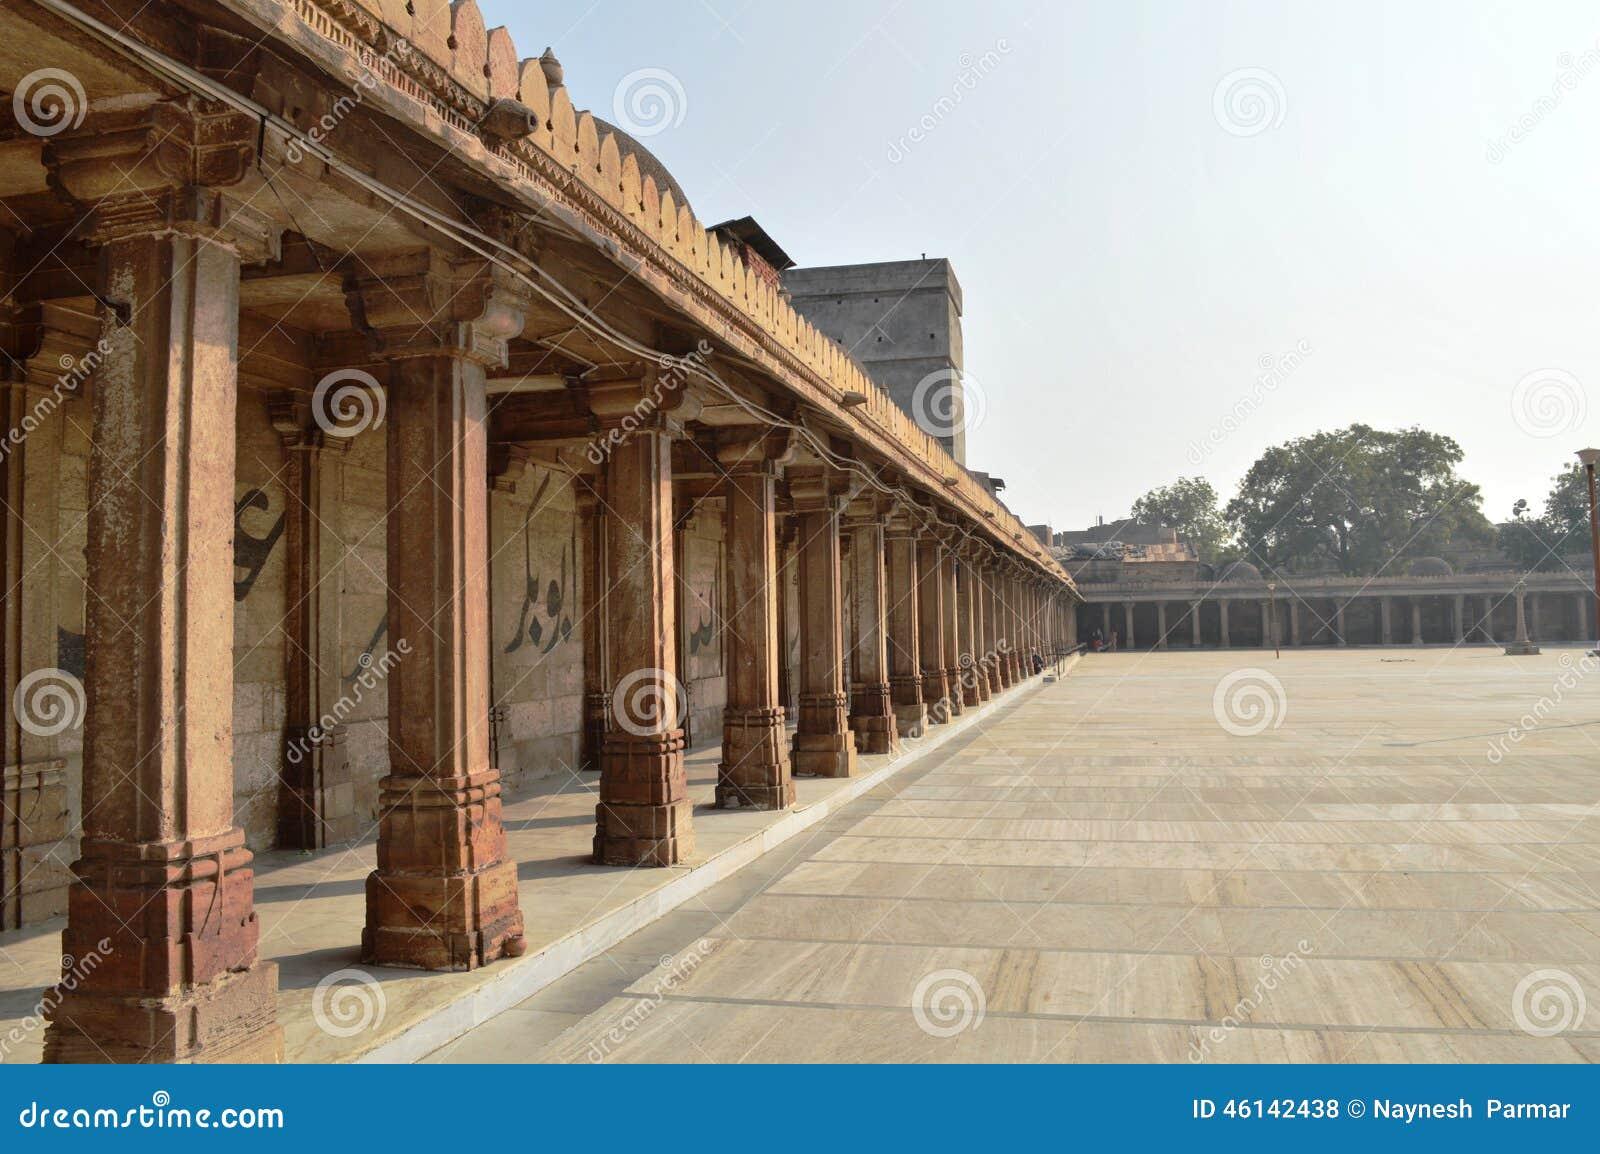 Jama Masjid Ahmedabad Stock Photo Image Of Gandhi More 46142438